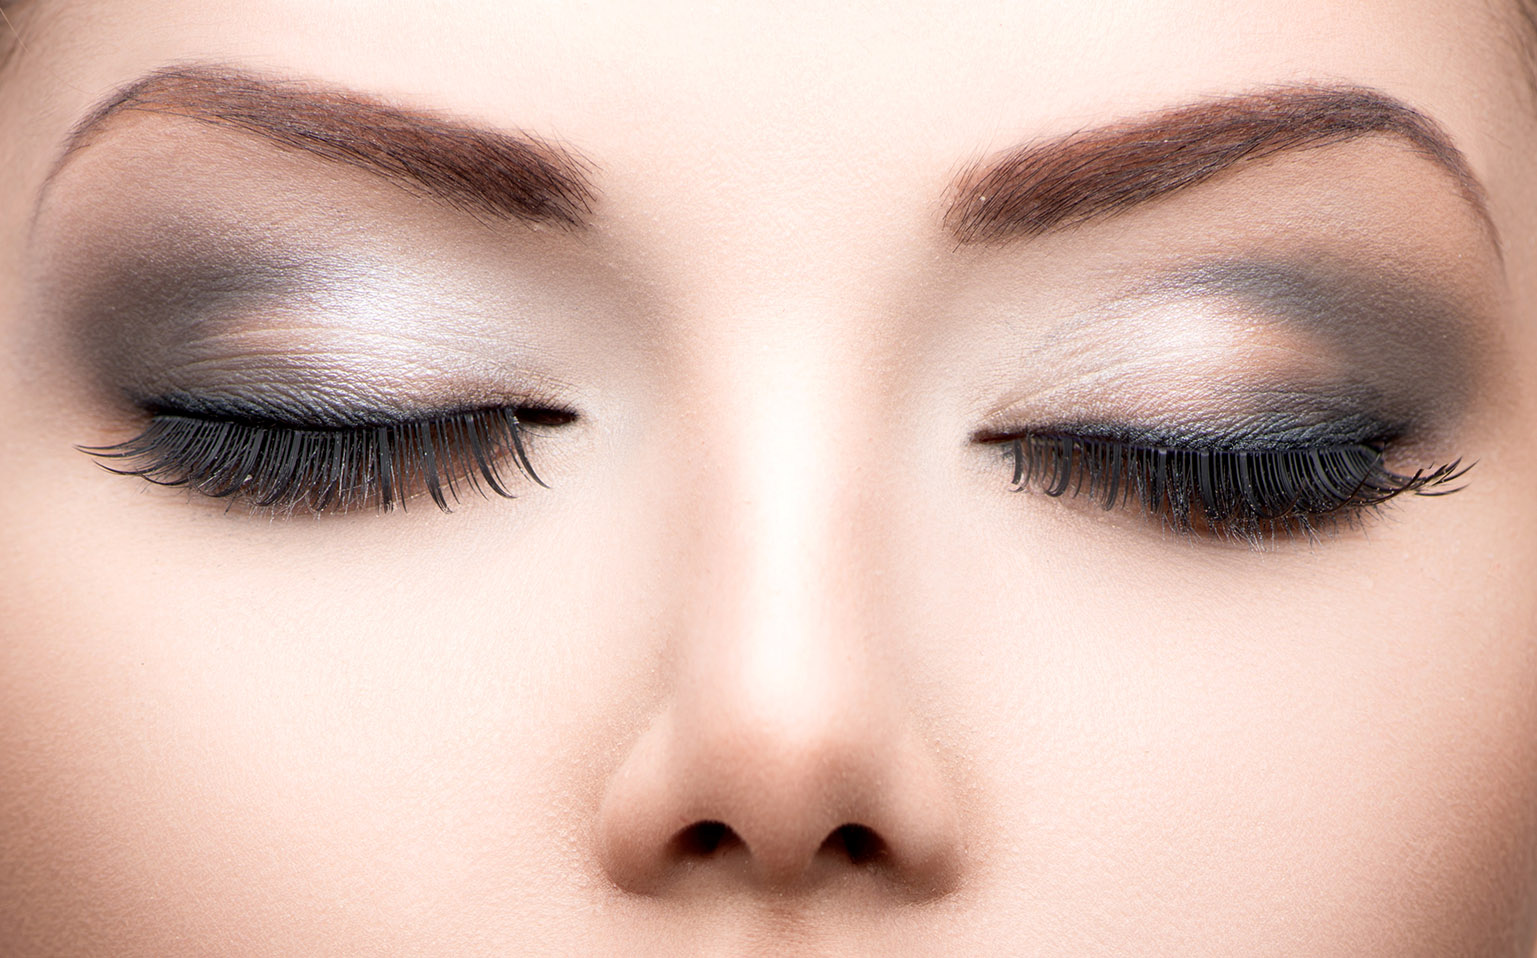 eyebrowssmall2.jpg